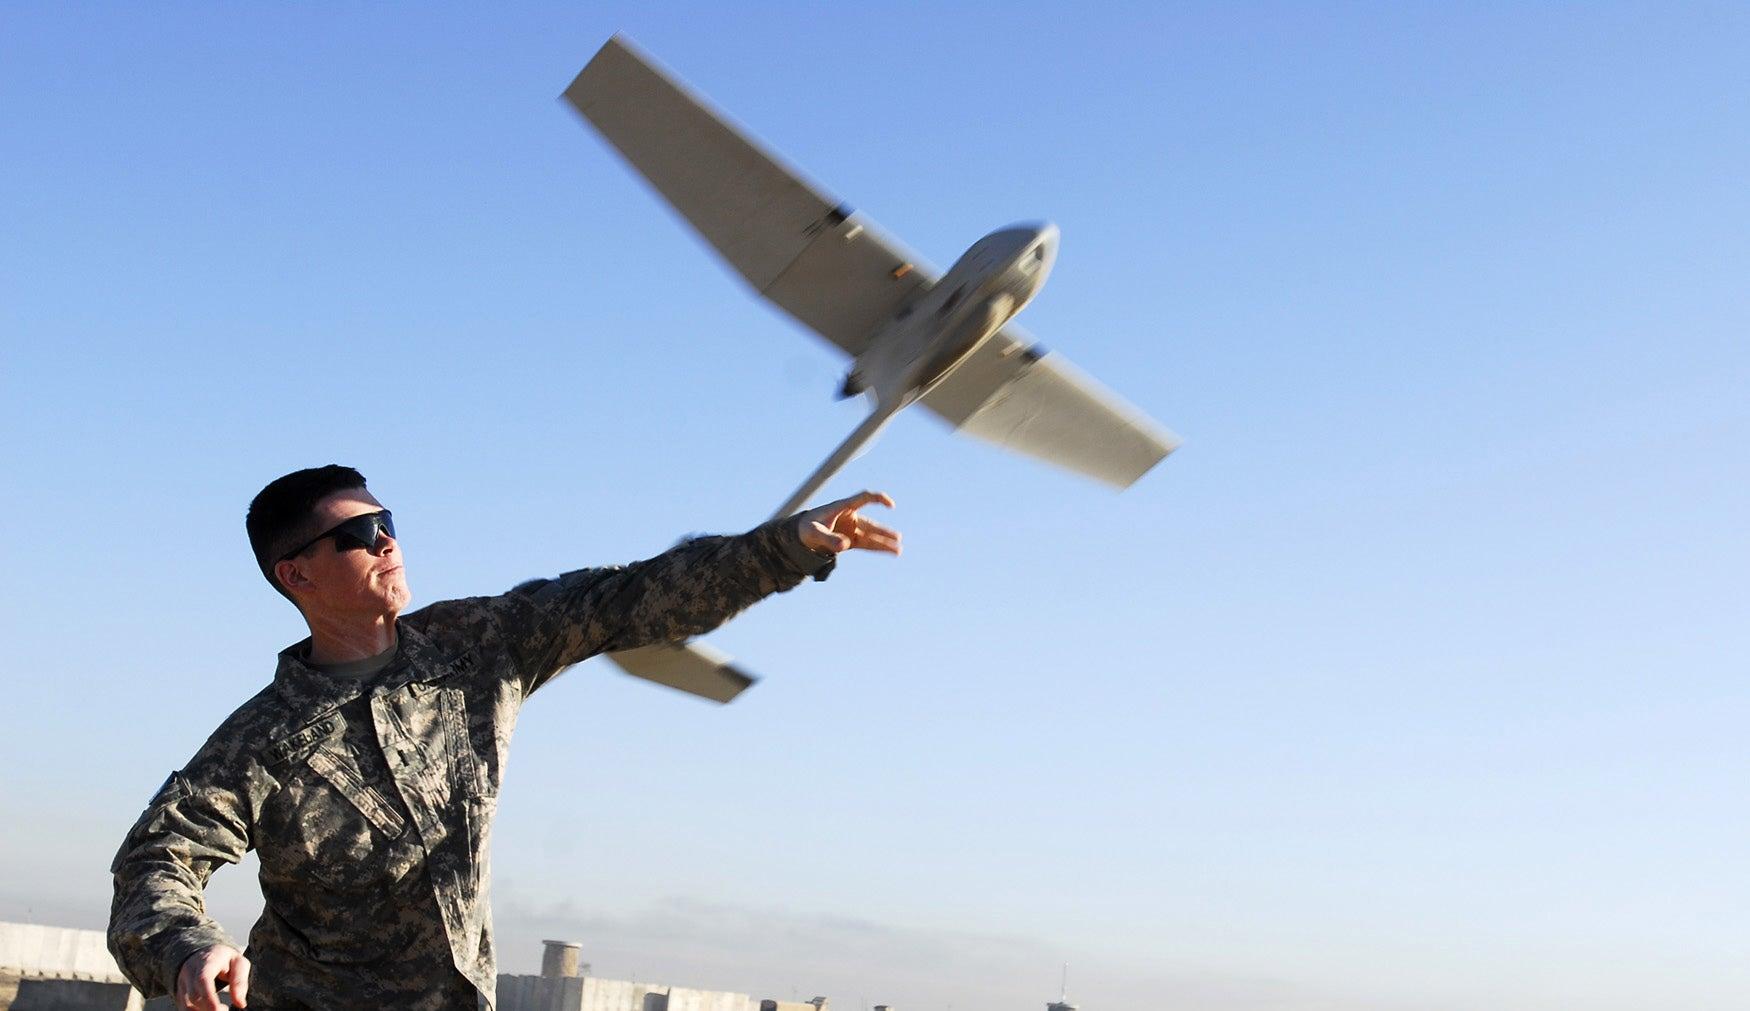 Solider In Iraq Tosses Raven UAV